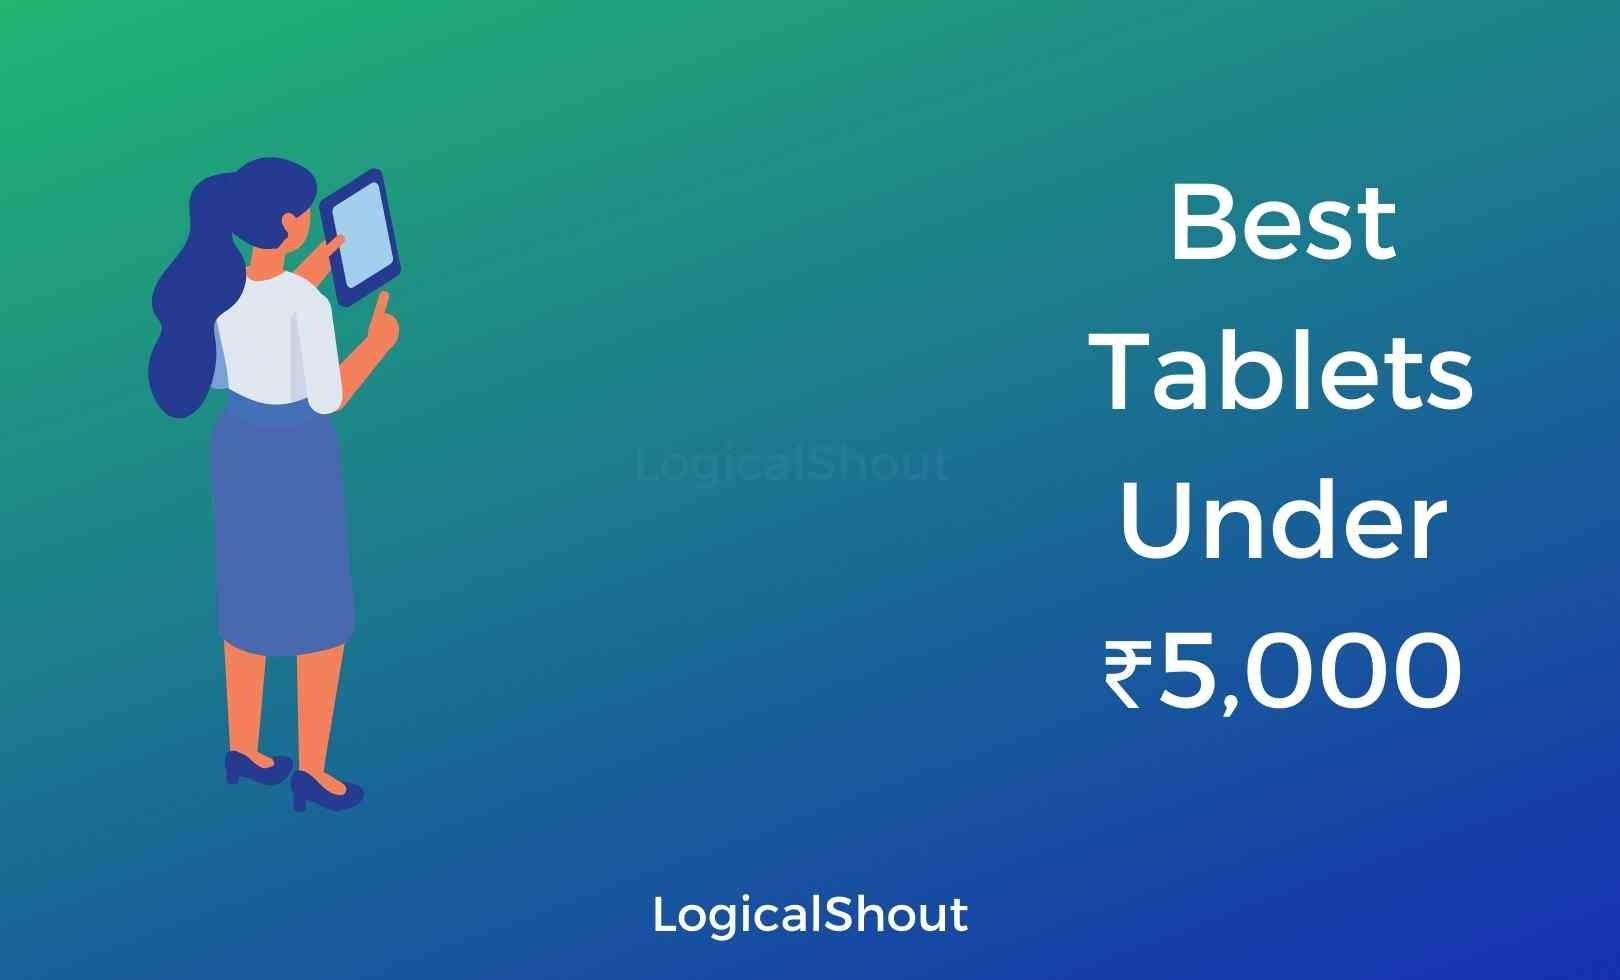 Best Tablets Under 5000